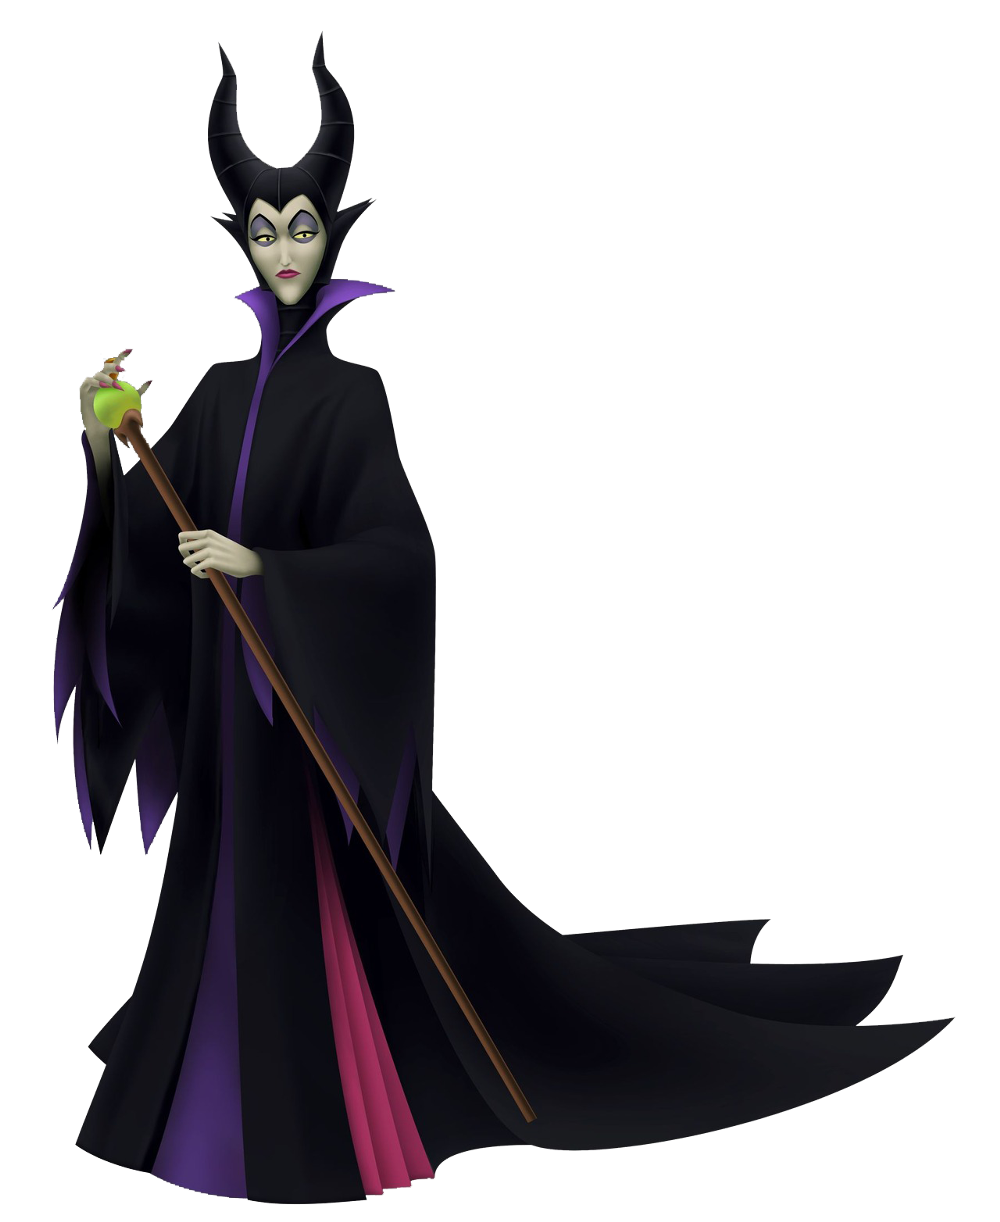 Maleficent Handmade Horns Cosplay Headband Custom Made Sold By Kornelia Kiwi Cosplay